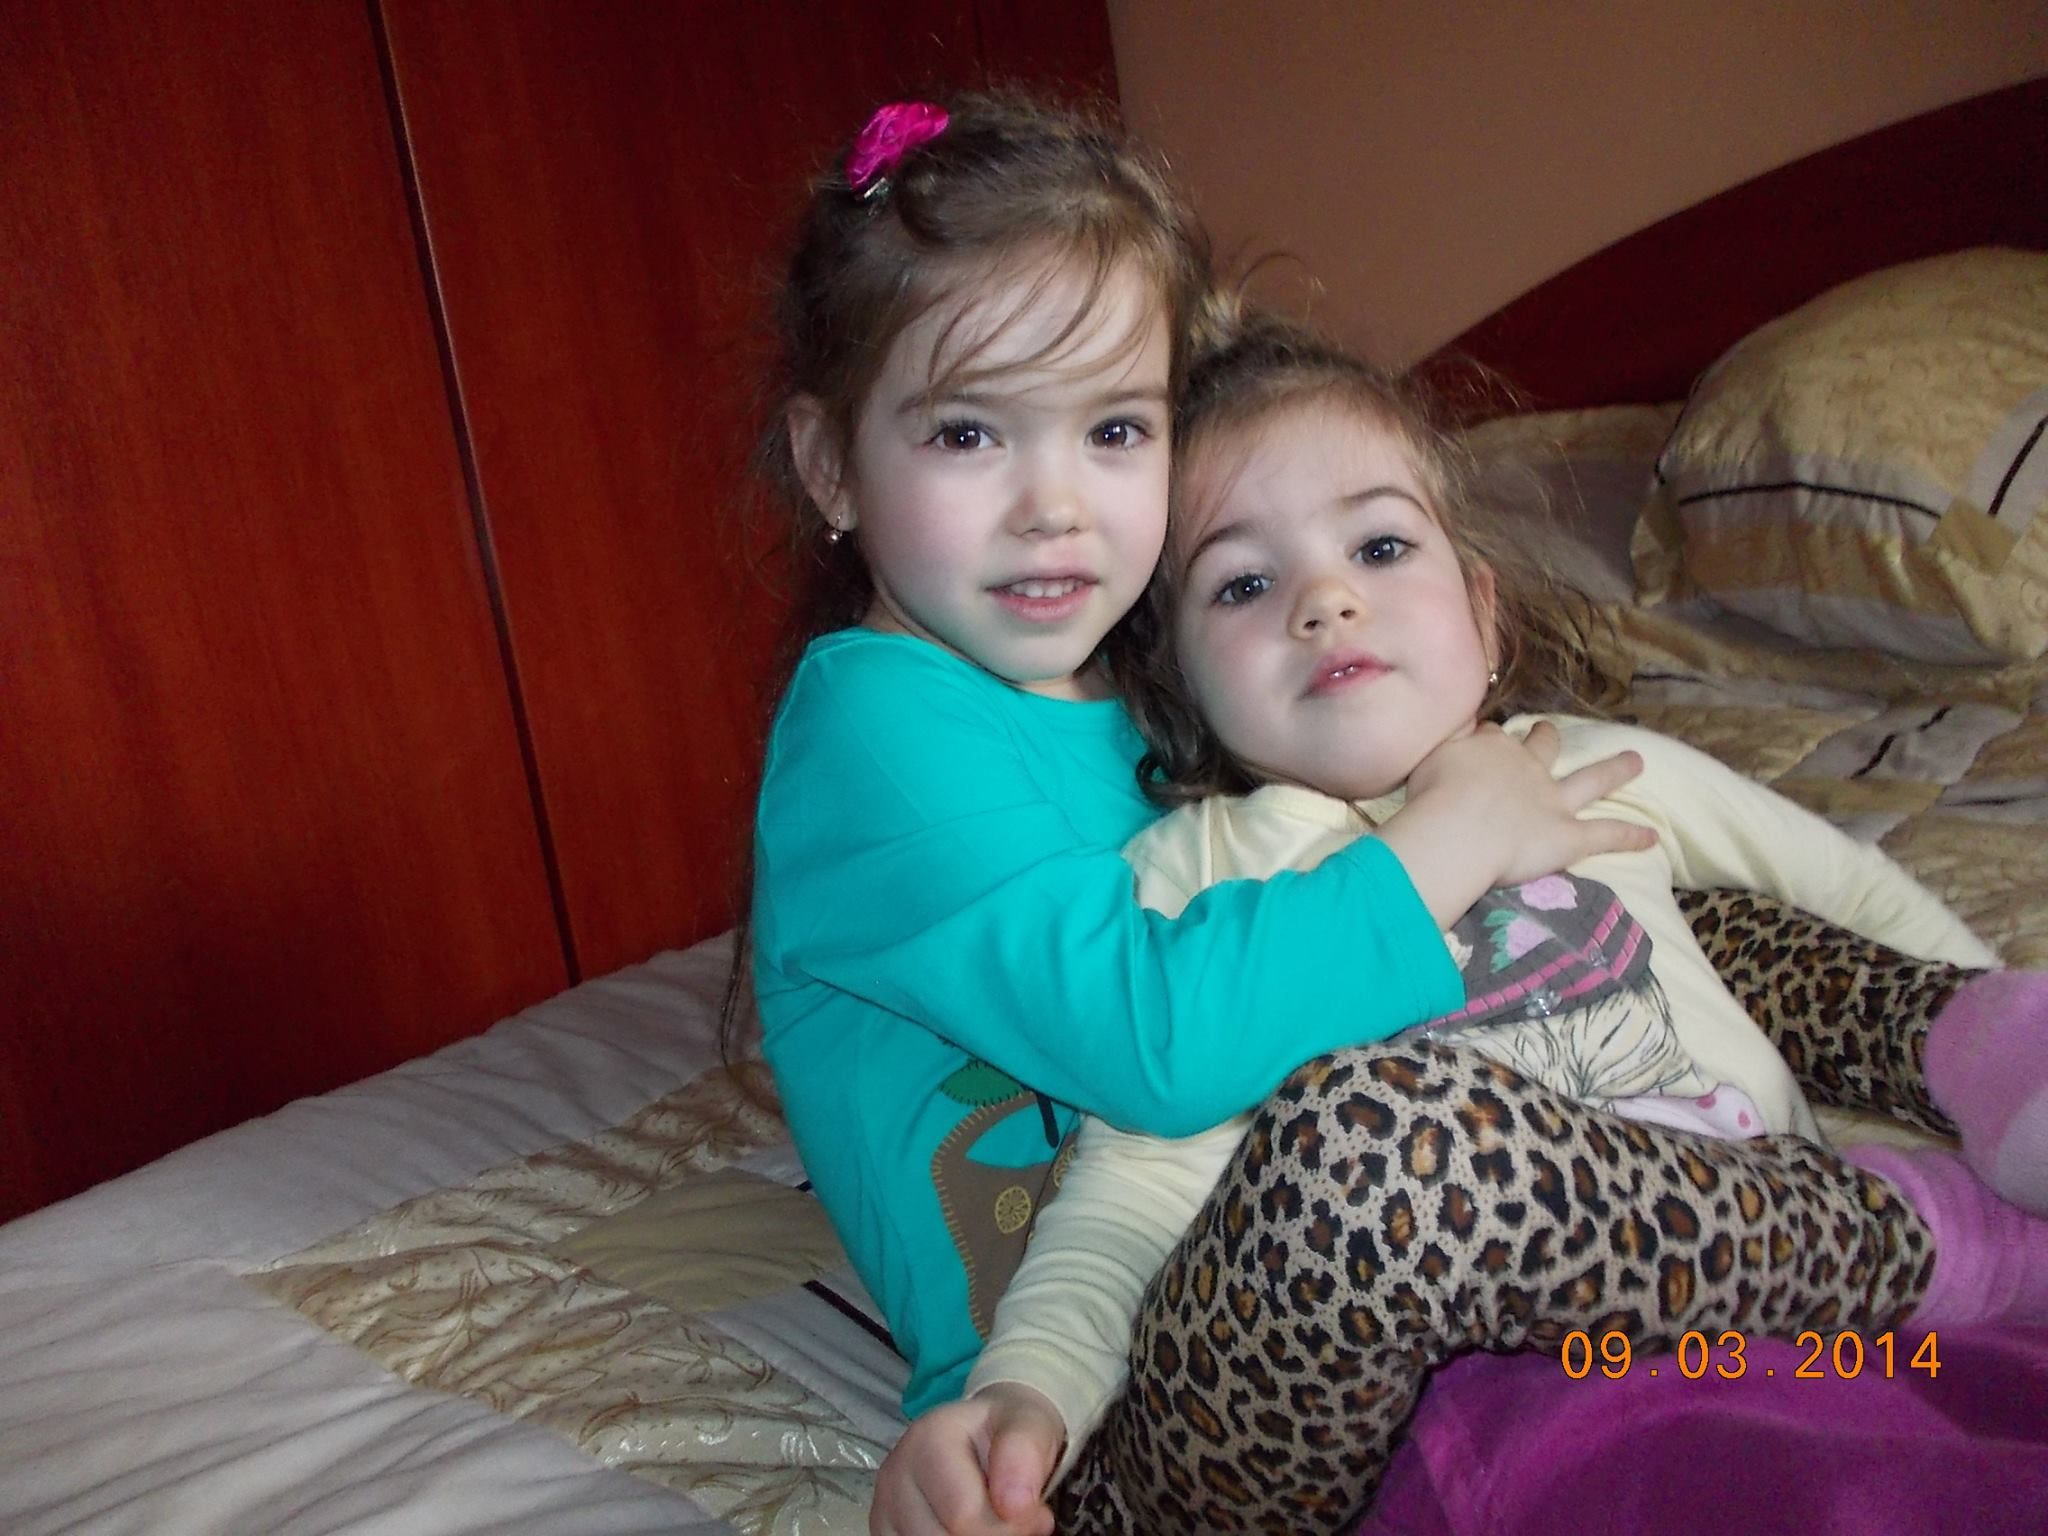 Surorile Anastasia si Rebeca se inteleg foarte bine